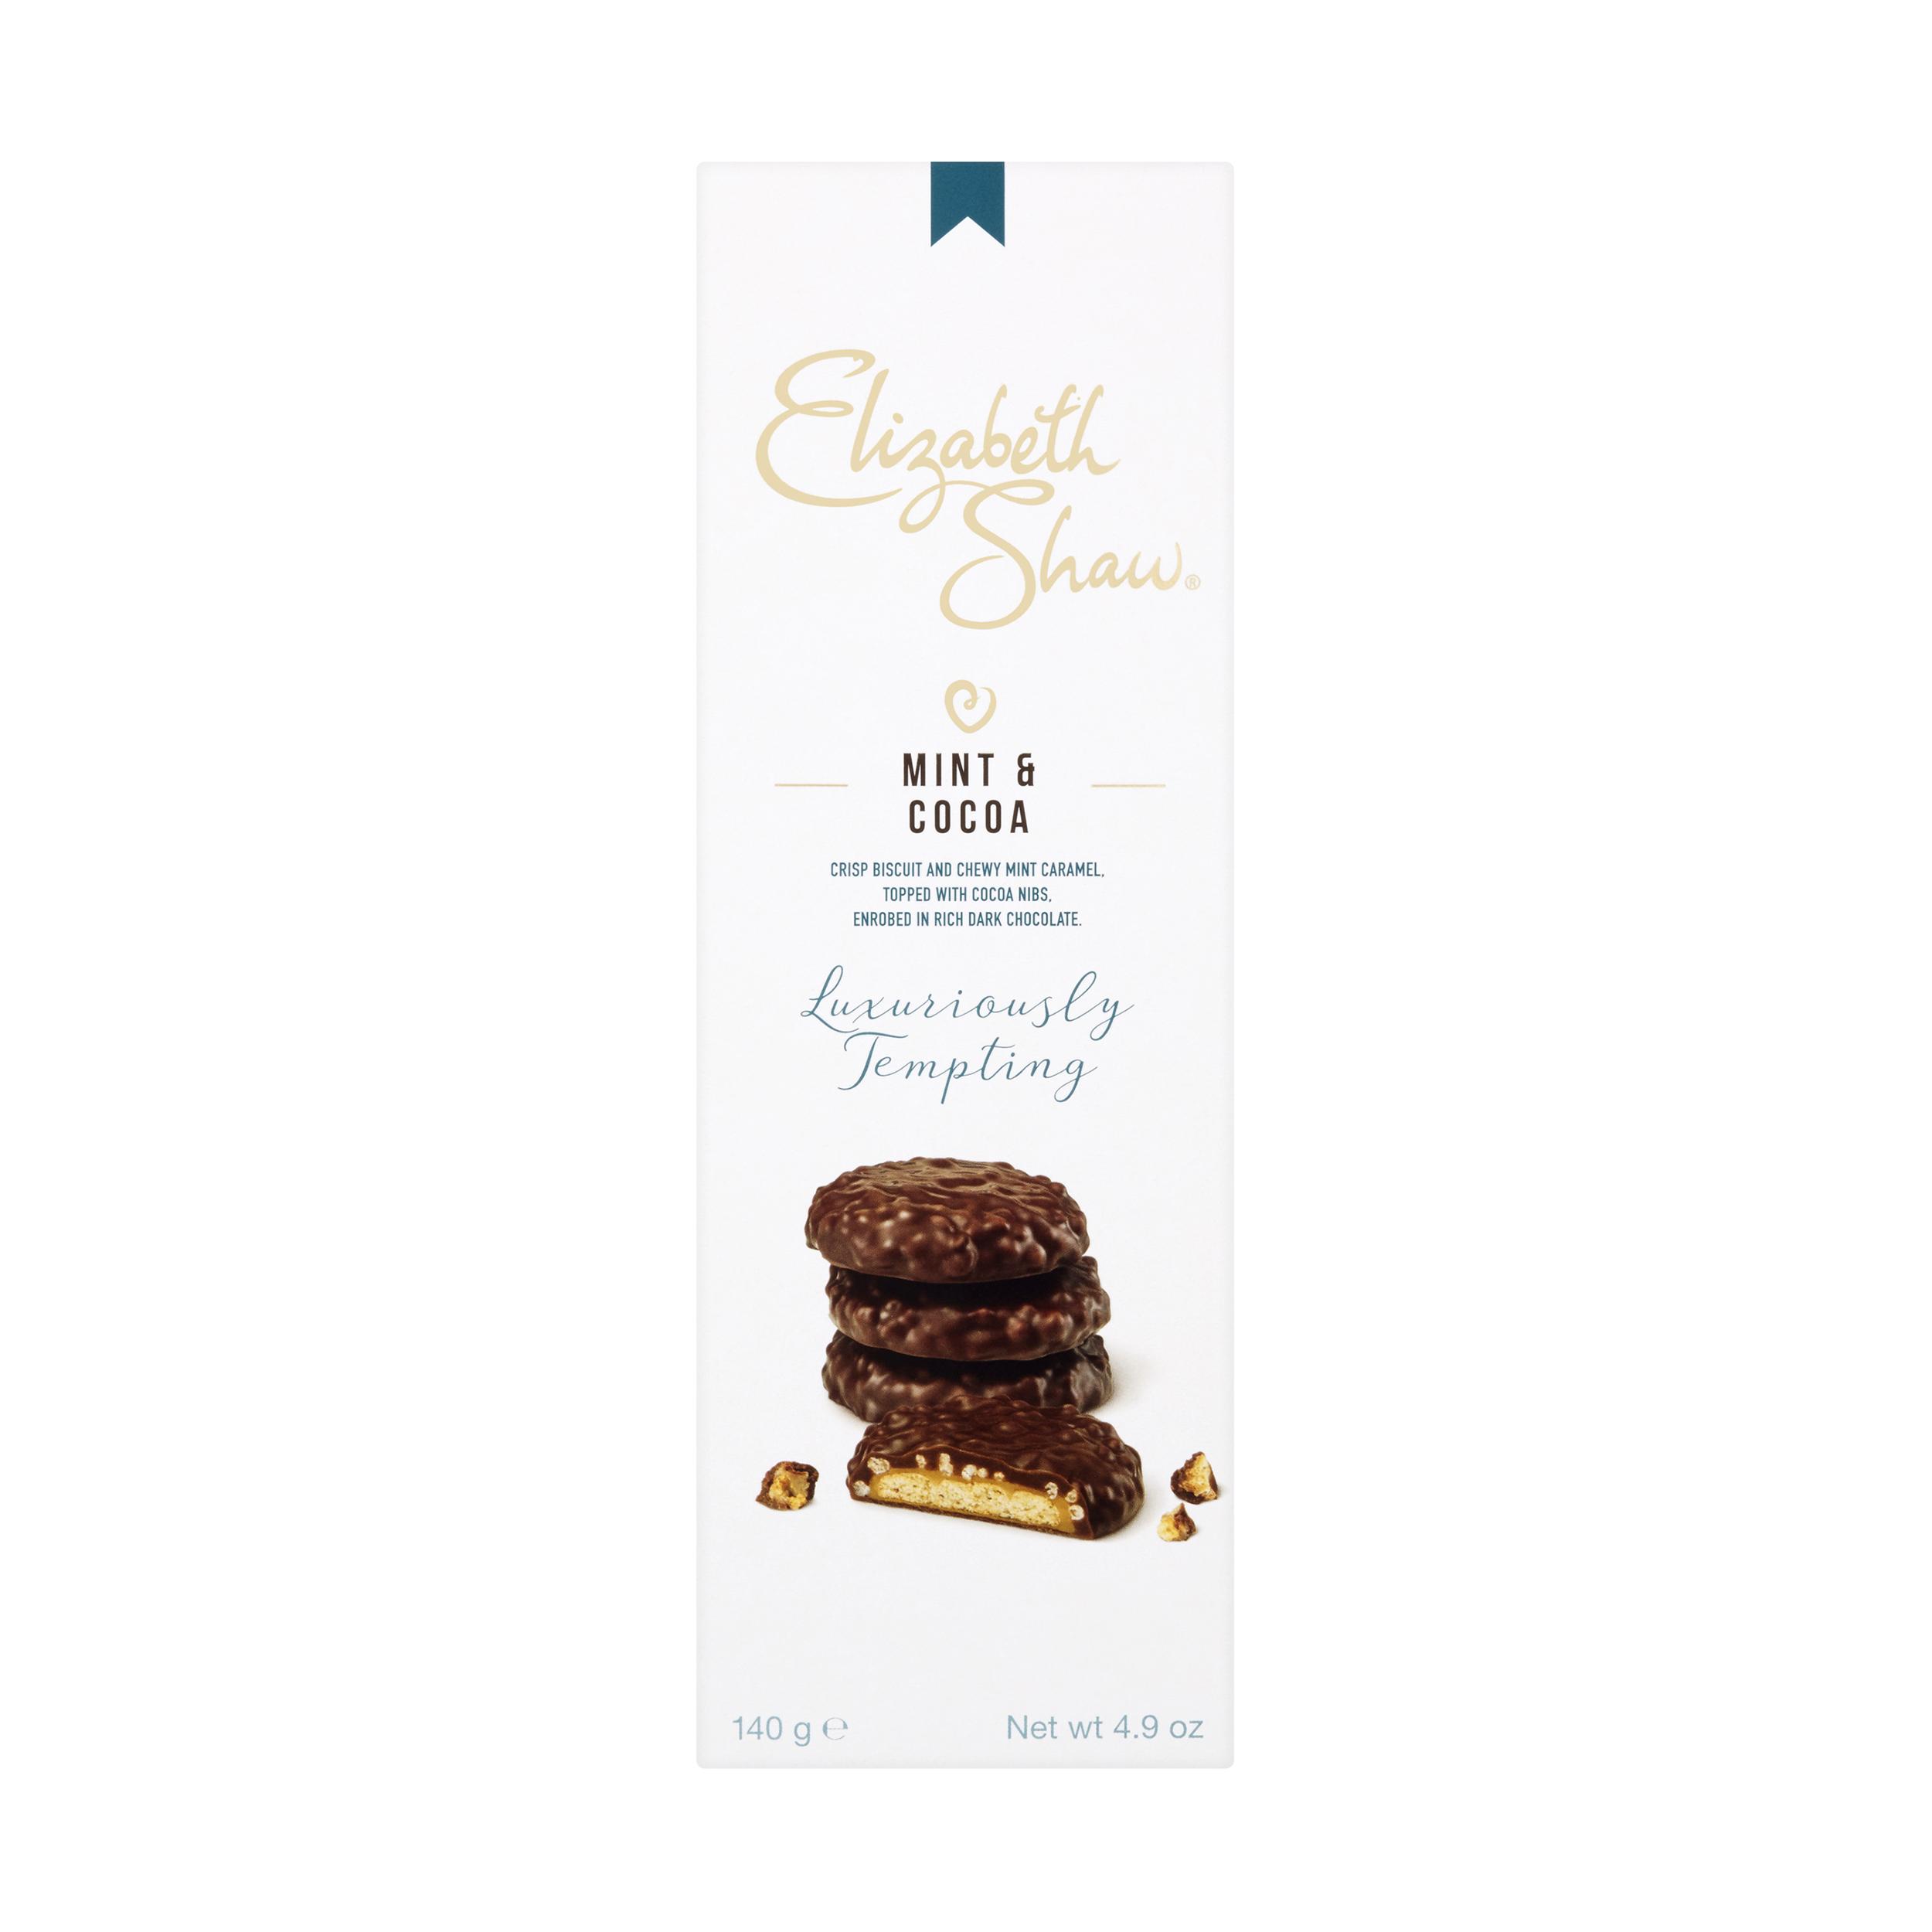 PG Tips Tea Pyramid 1 Cup Ref 67395661 Pack 1100 Buy 2 get 2 Free Elizabeth Shaw Biscuits Oct-Dec 19